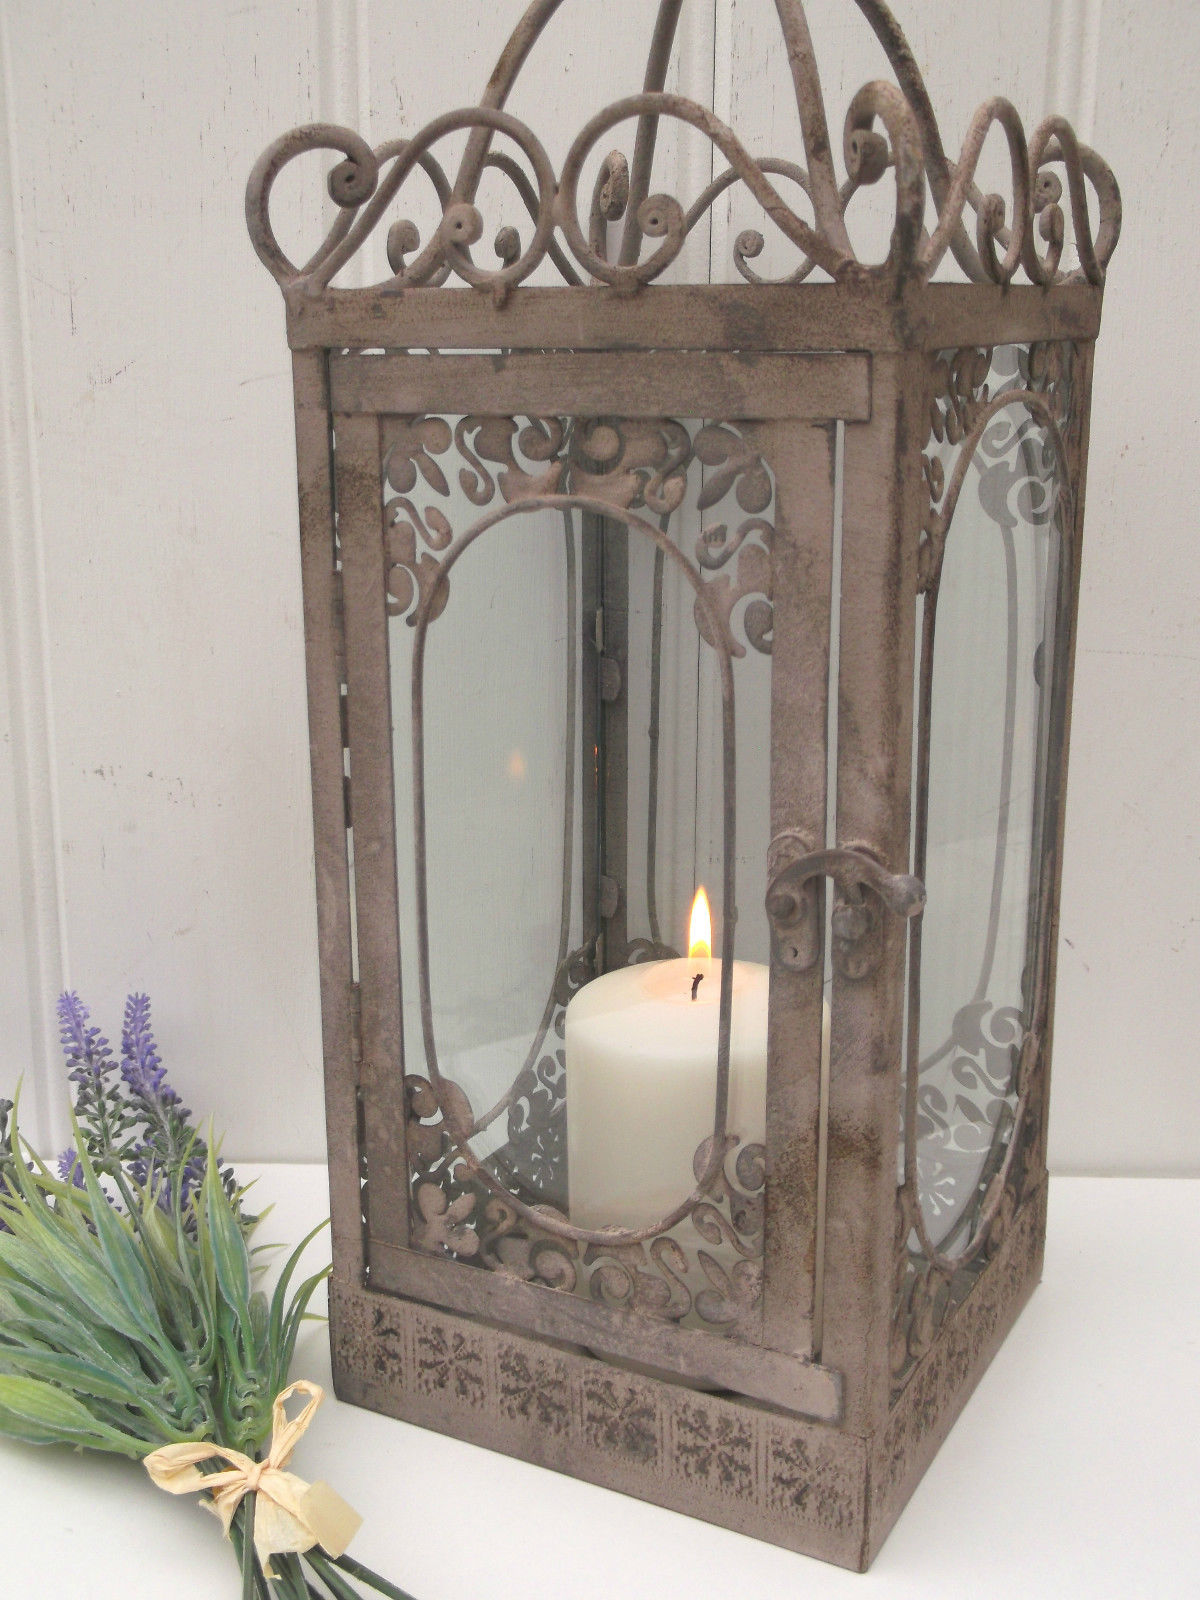 Vintage Style French Grey Large Lantern Candle Holder Rustic Shabby Chic Garden Amazing Grace